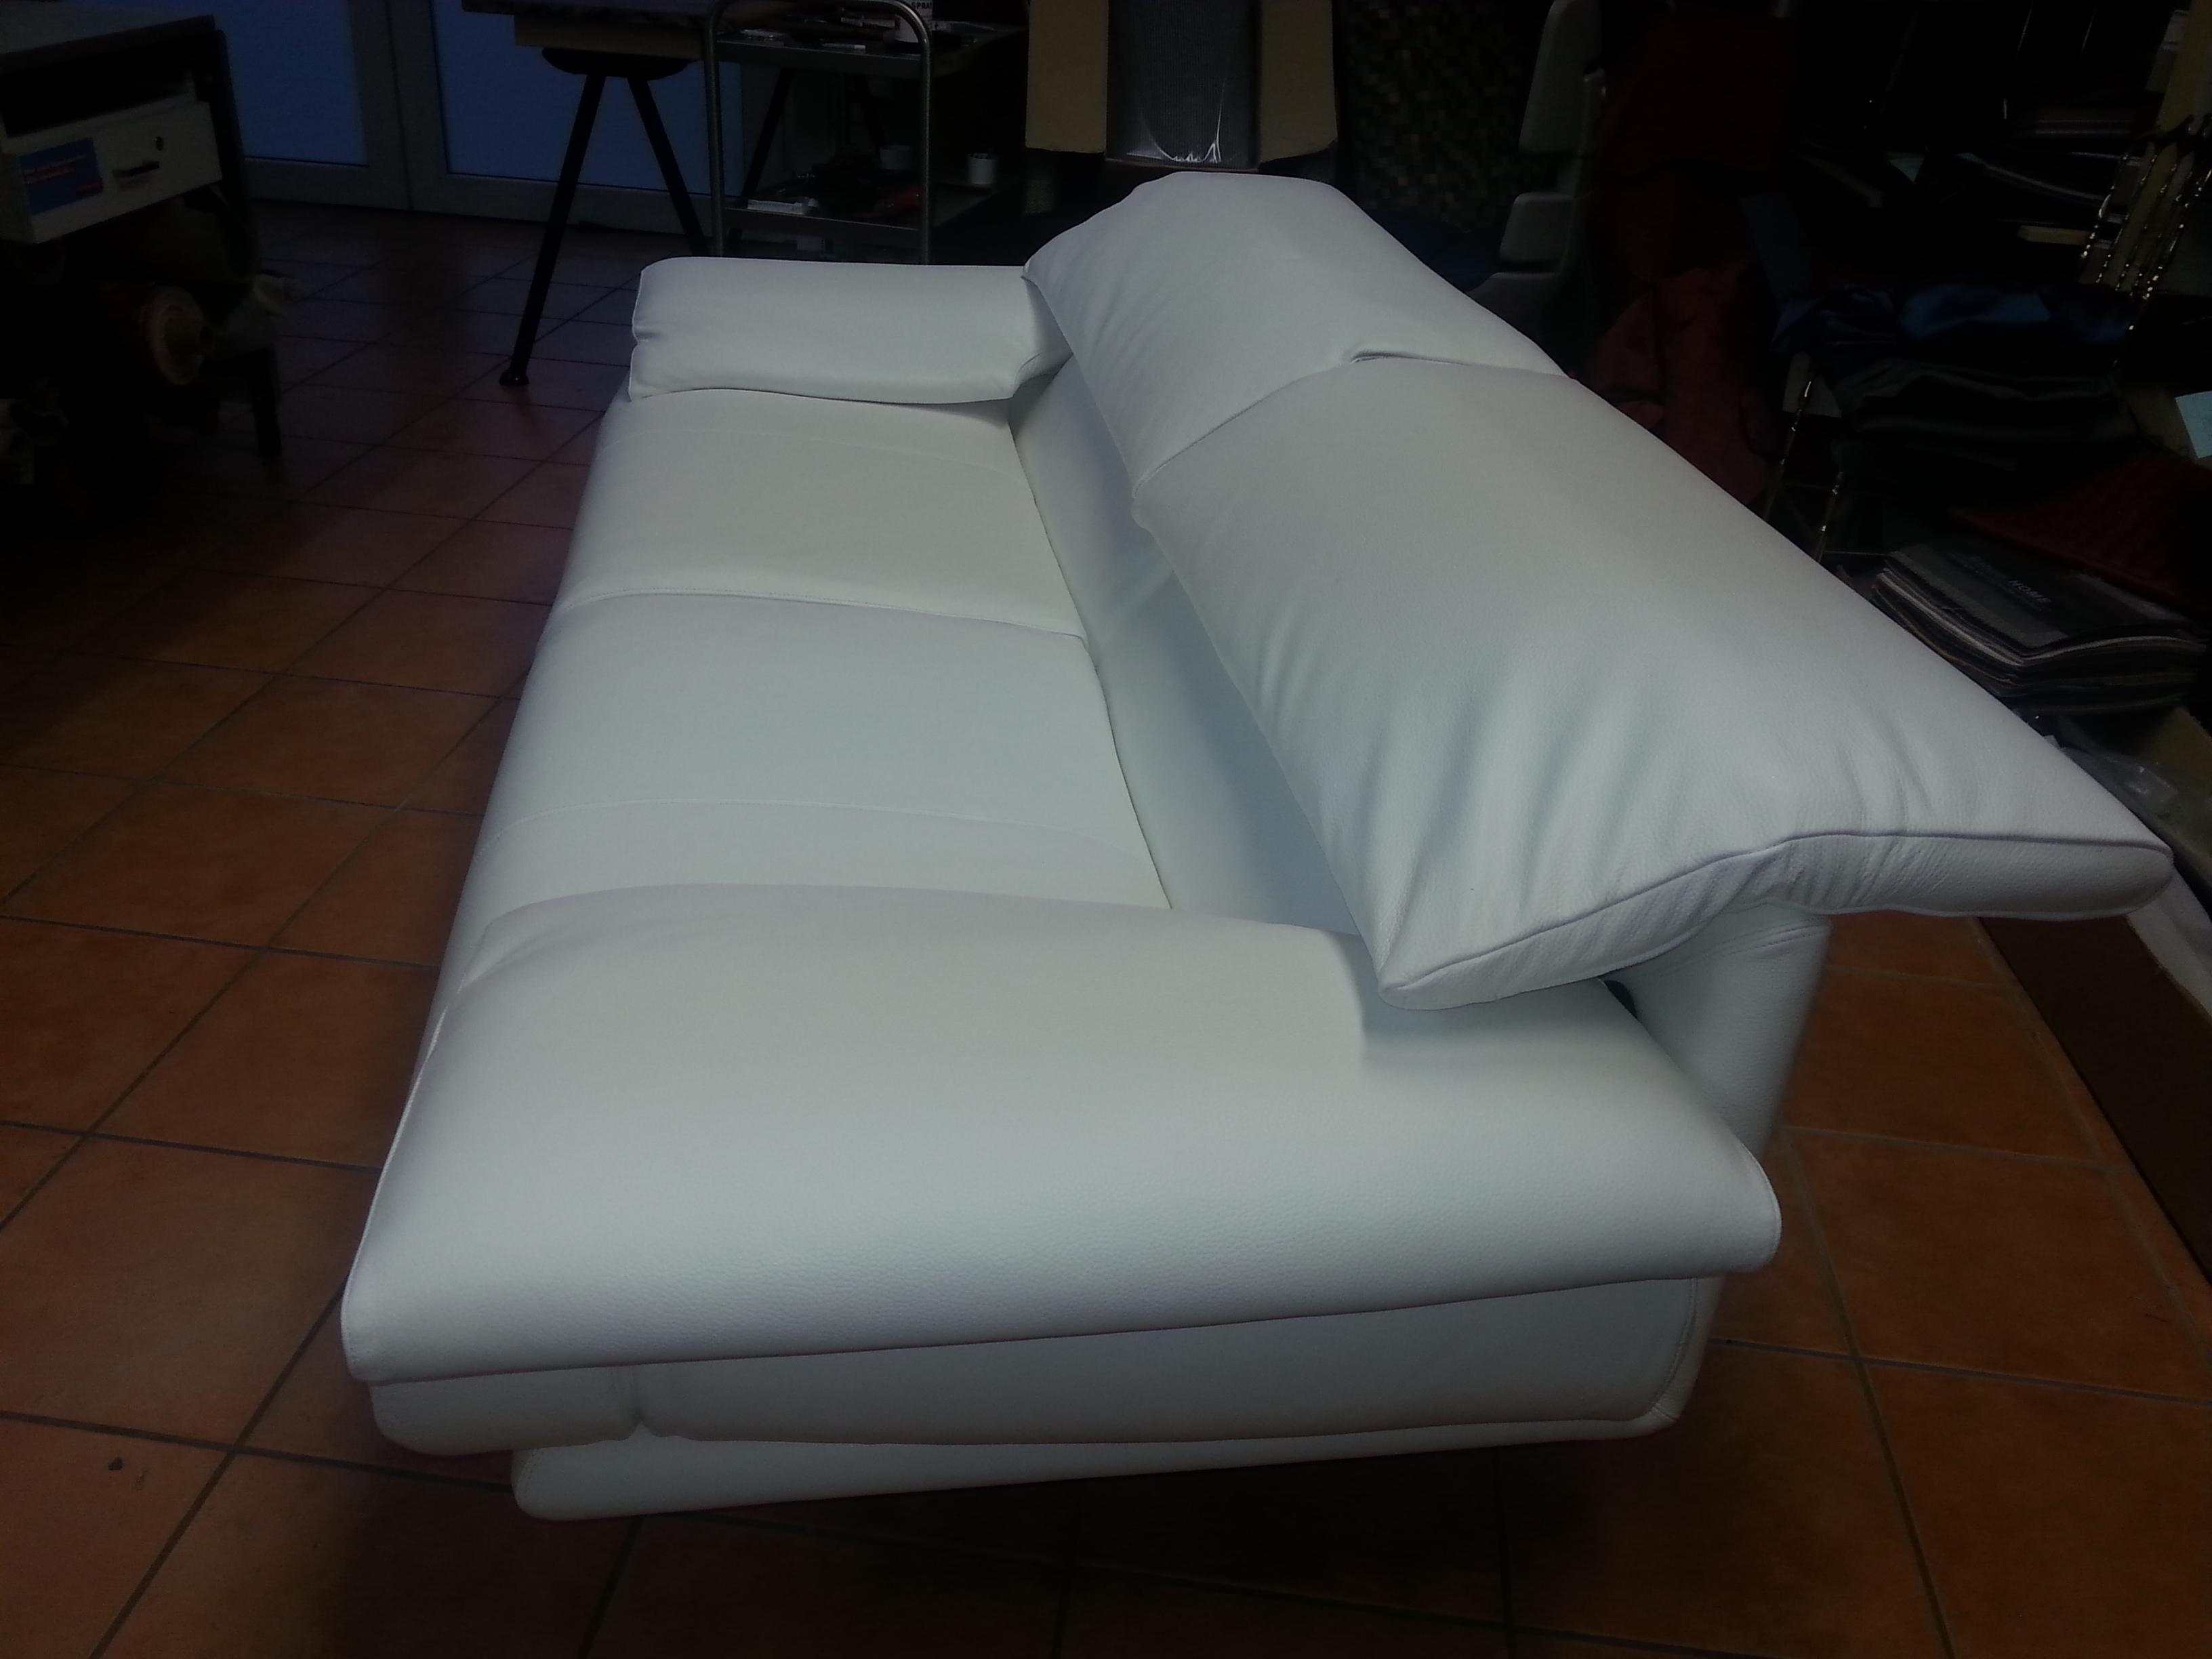 B&B iTALIA ( Alanda)bezogen in Weißes Leder bezogen.